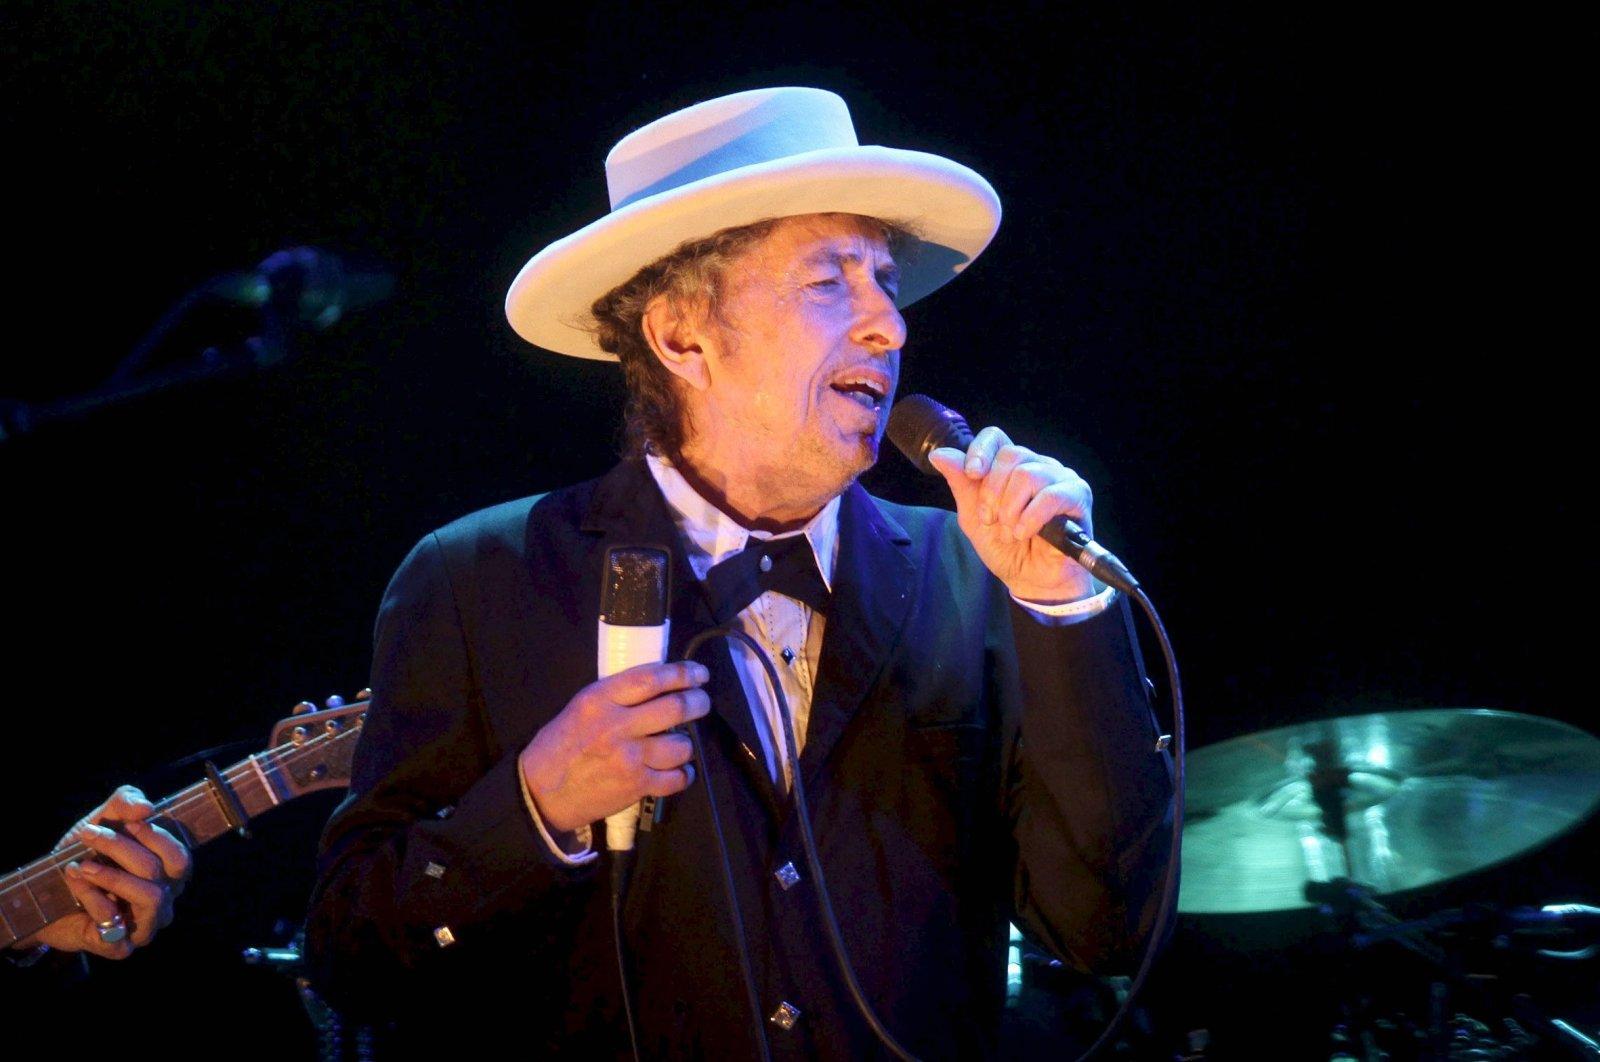 U.S. musician Bob Dylan performs at the Benicassim International Music Festival (FIB) in Benicassim, Spain, July 13, 2012. (EPA Photo)